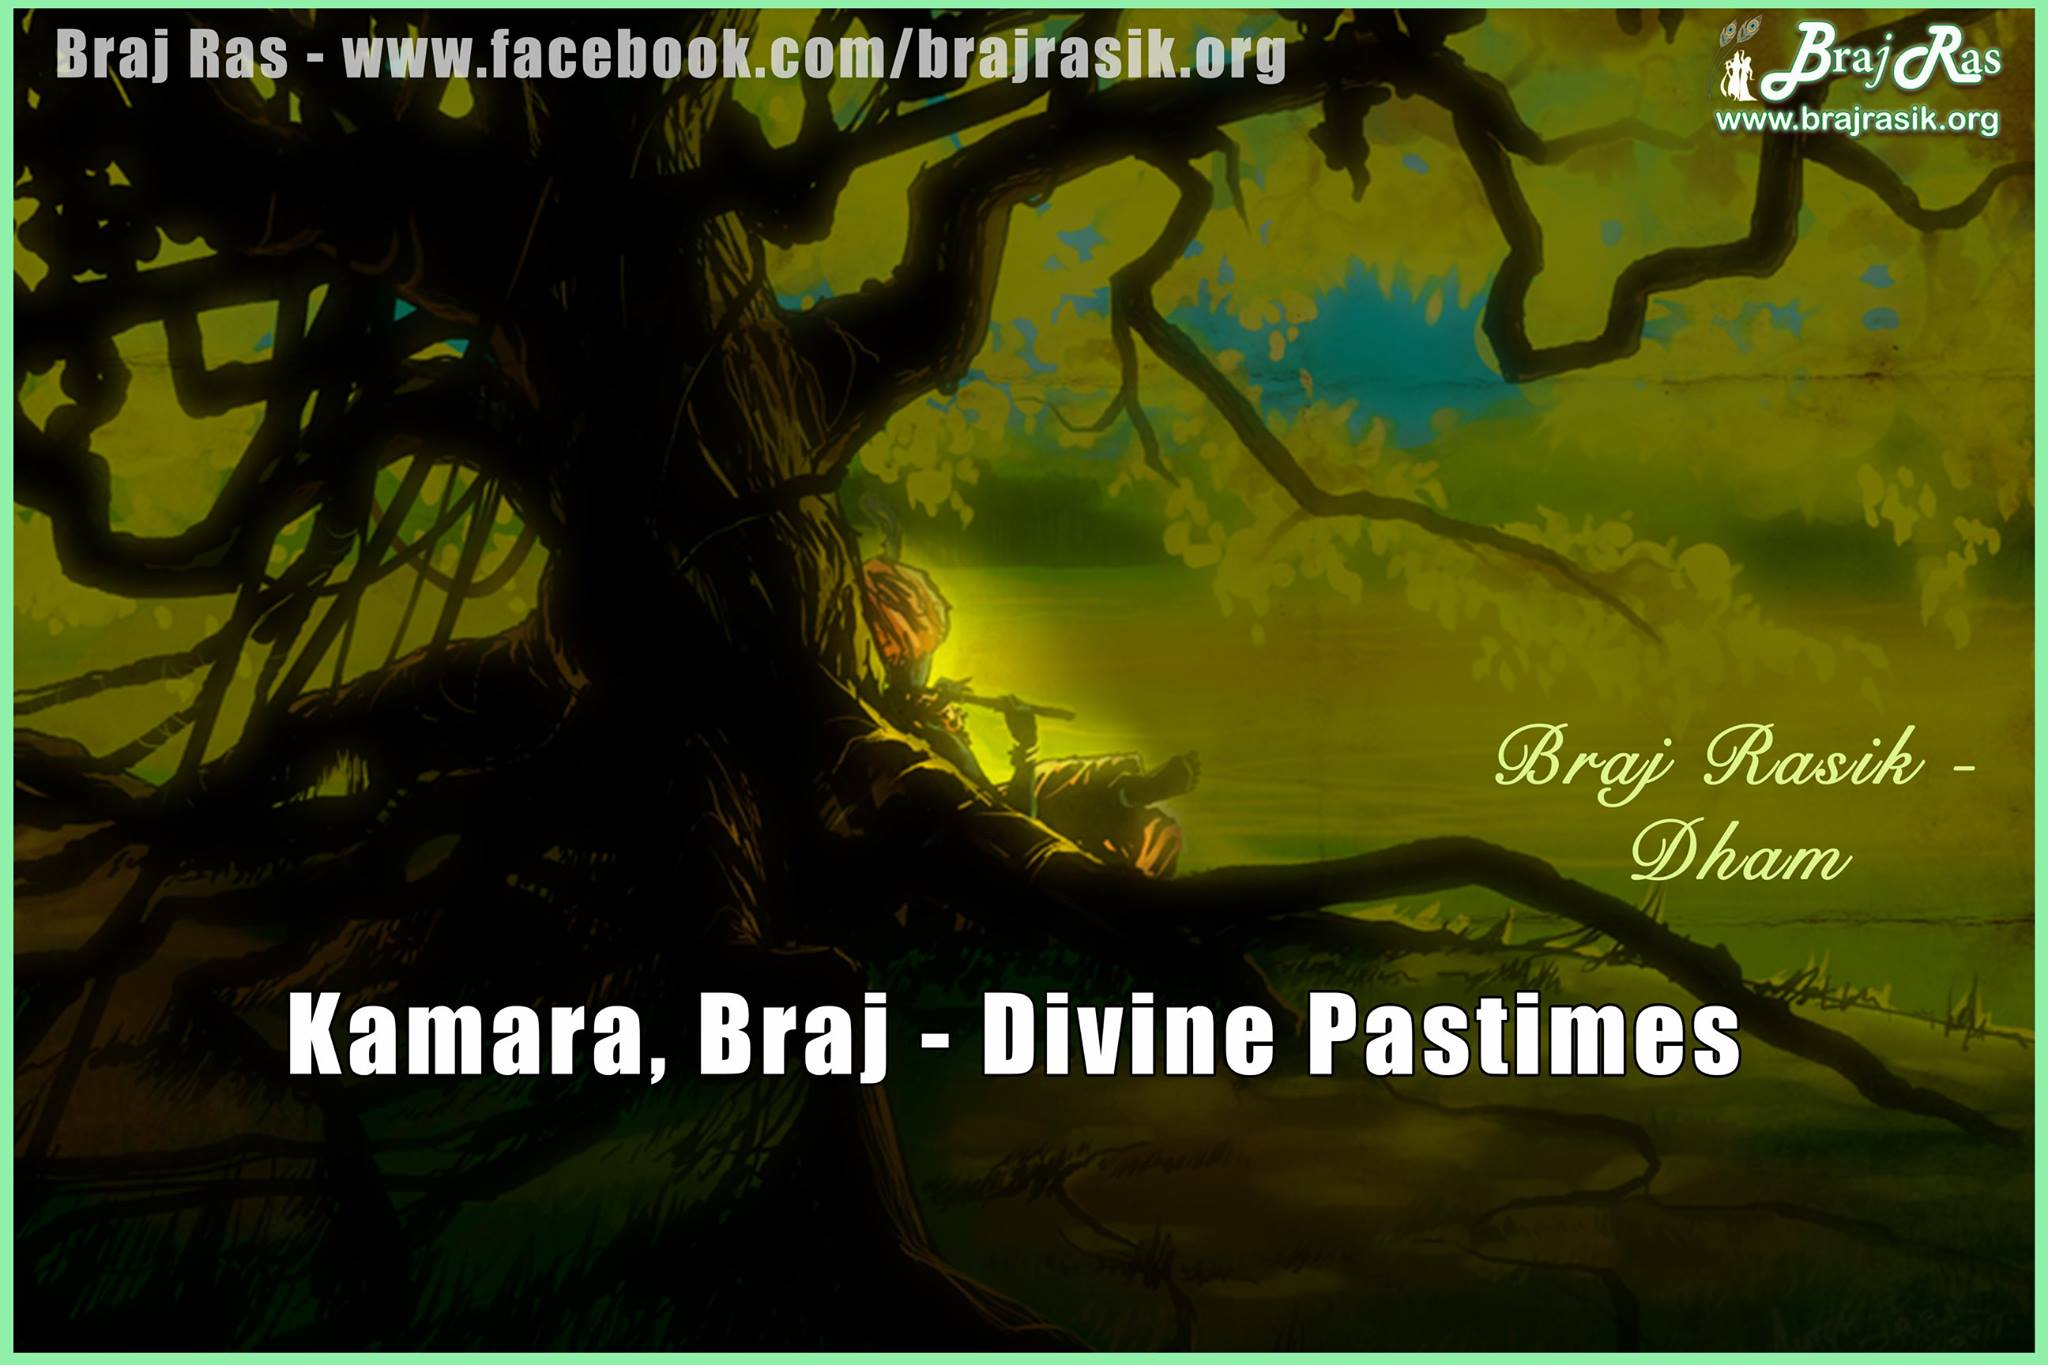 Kamara, Braj - Divine pastimes